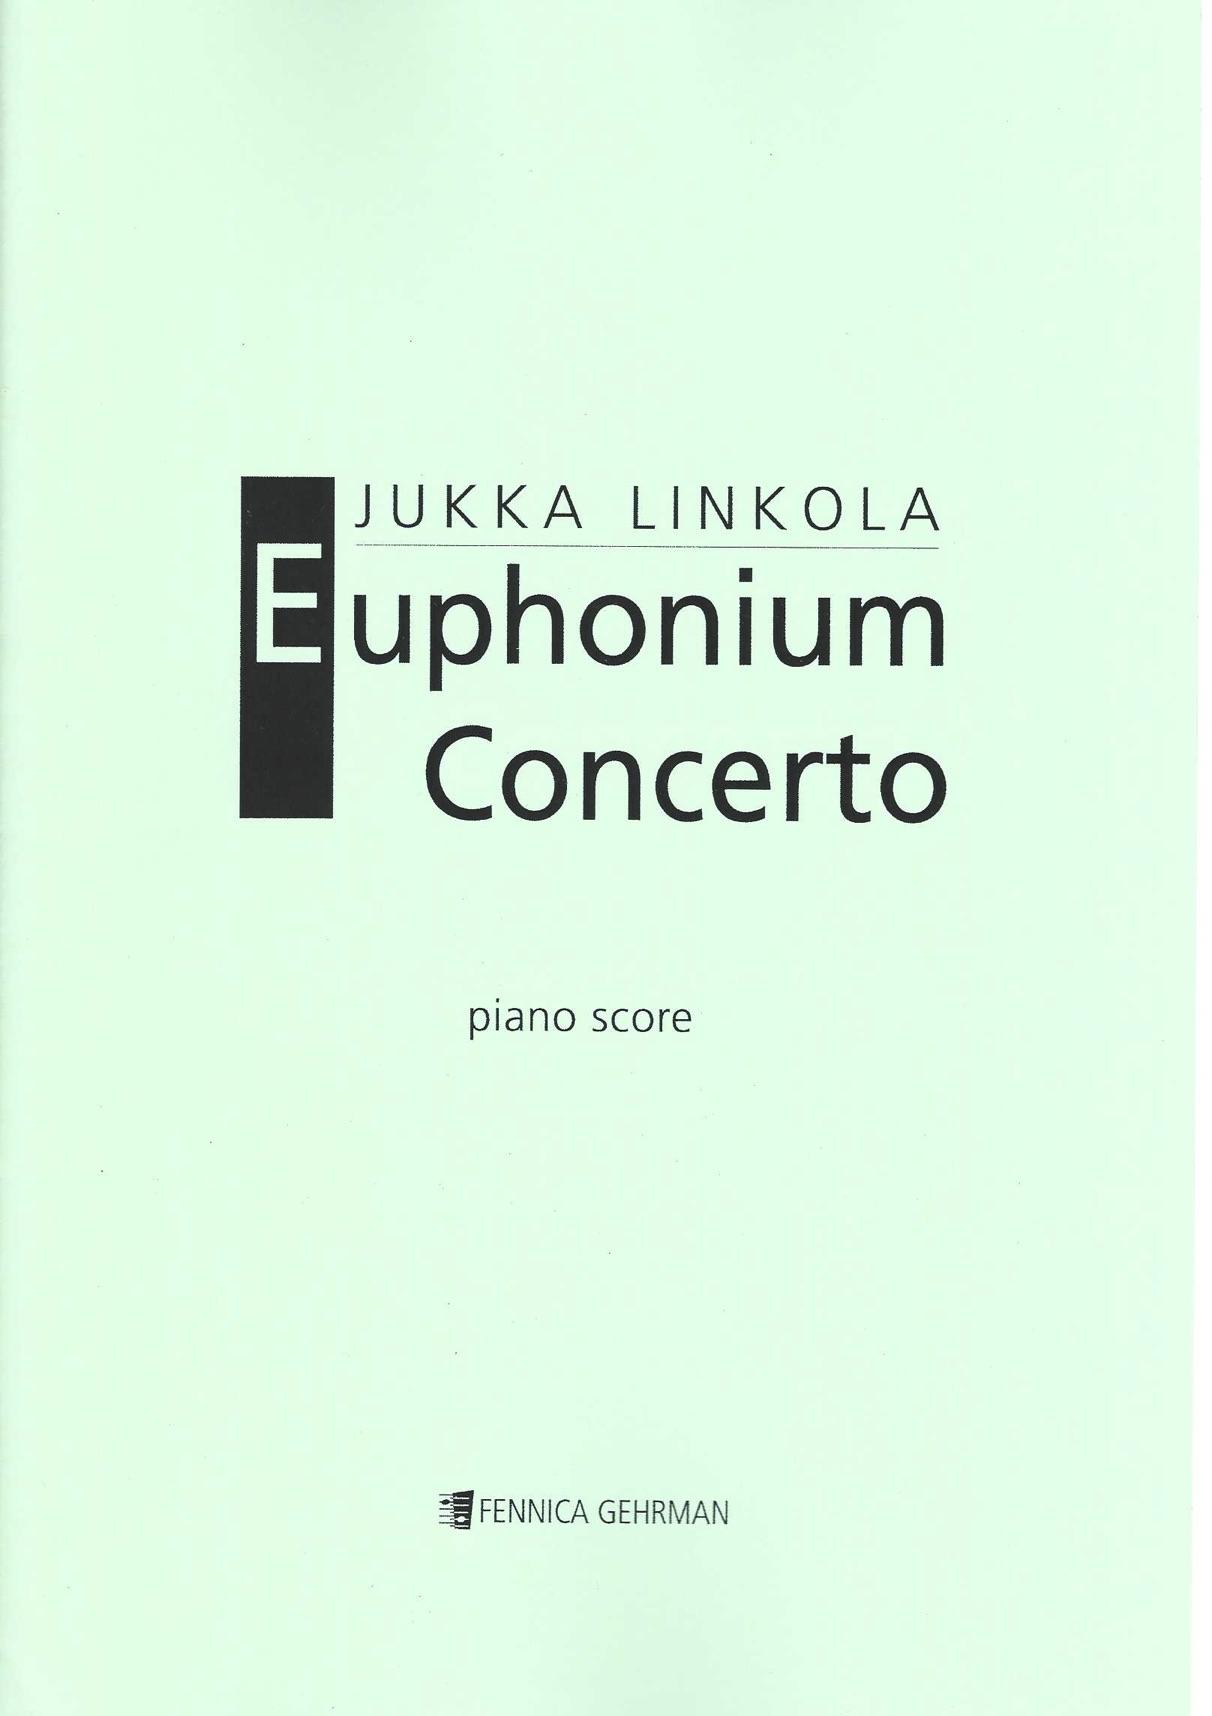 Euphonium Concerto - Yukka Linkola - Euphonium and Piano